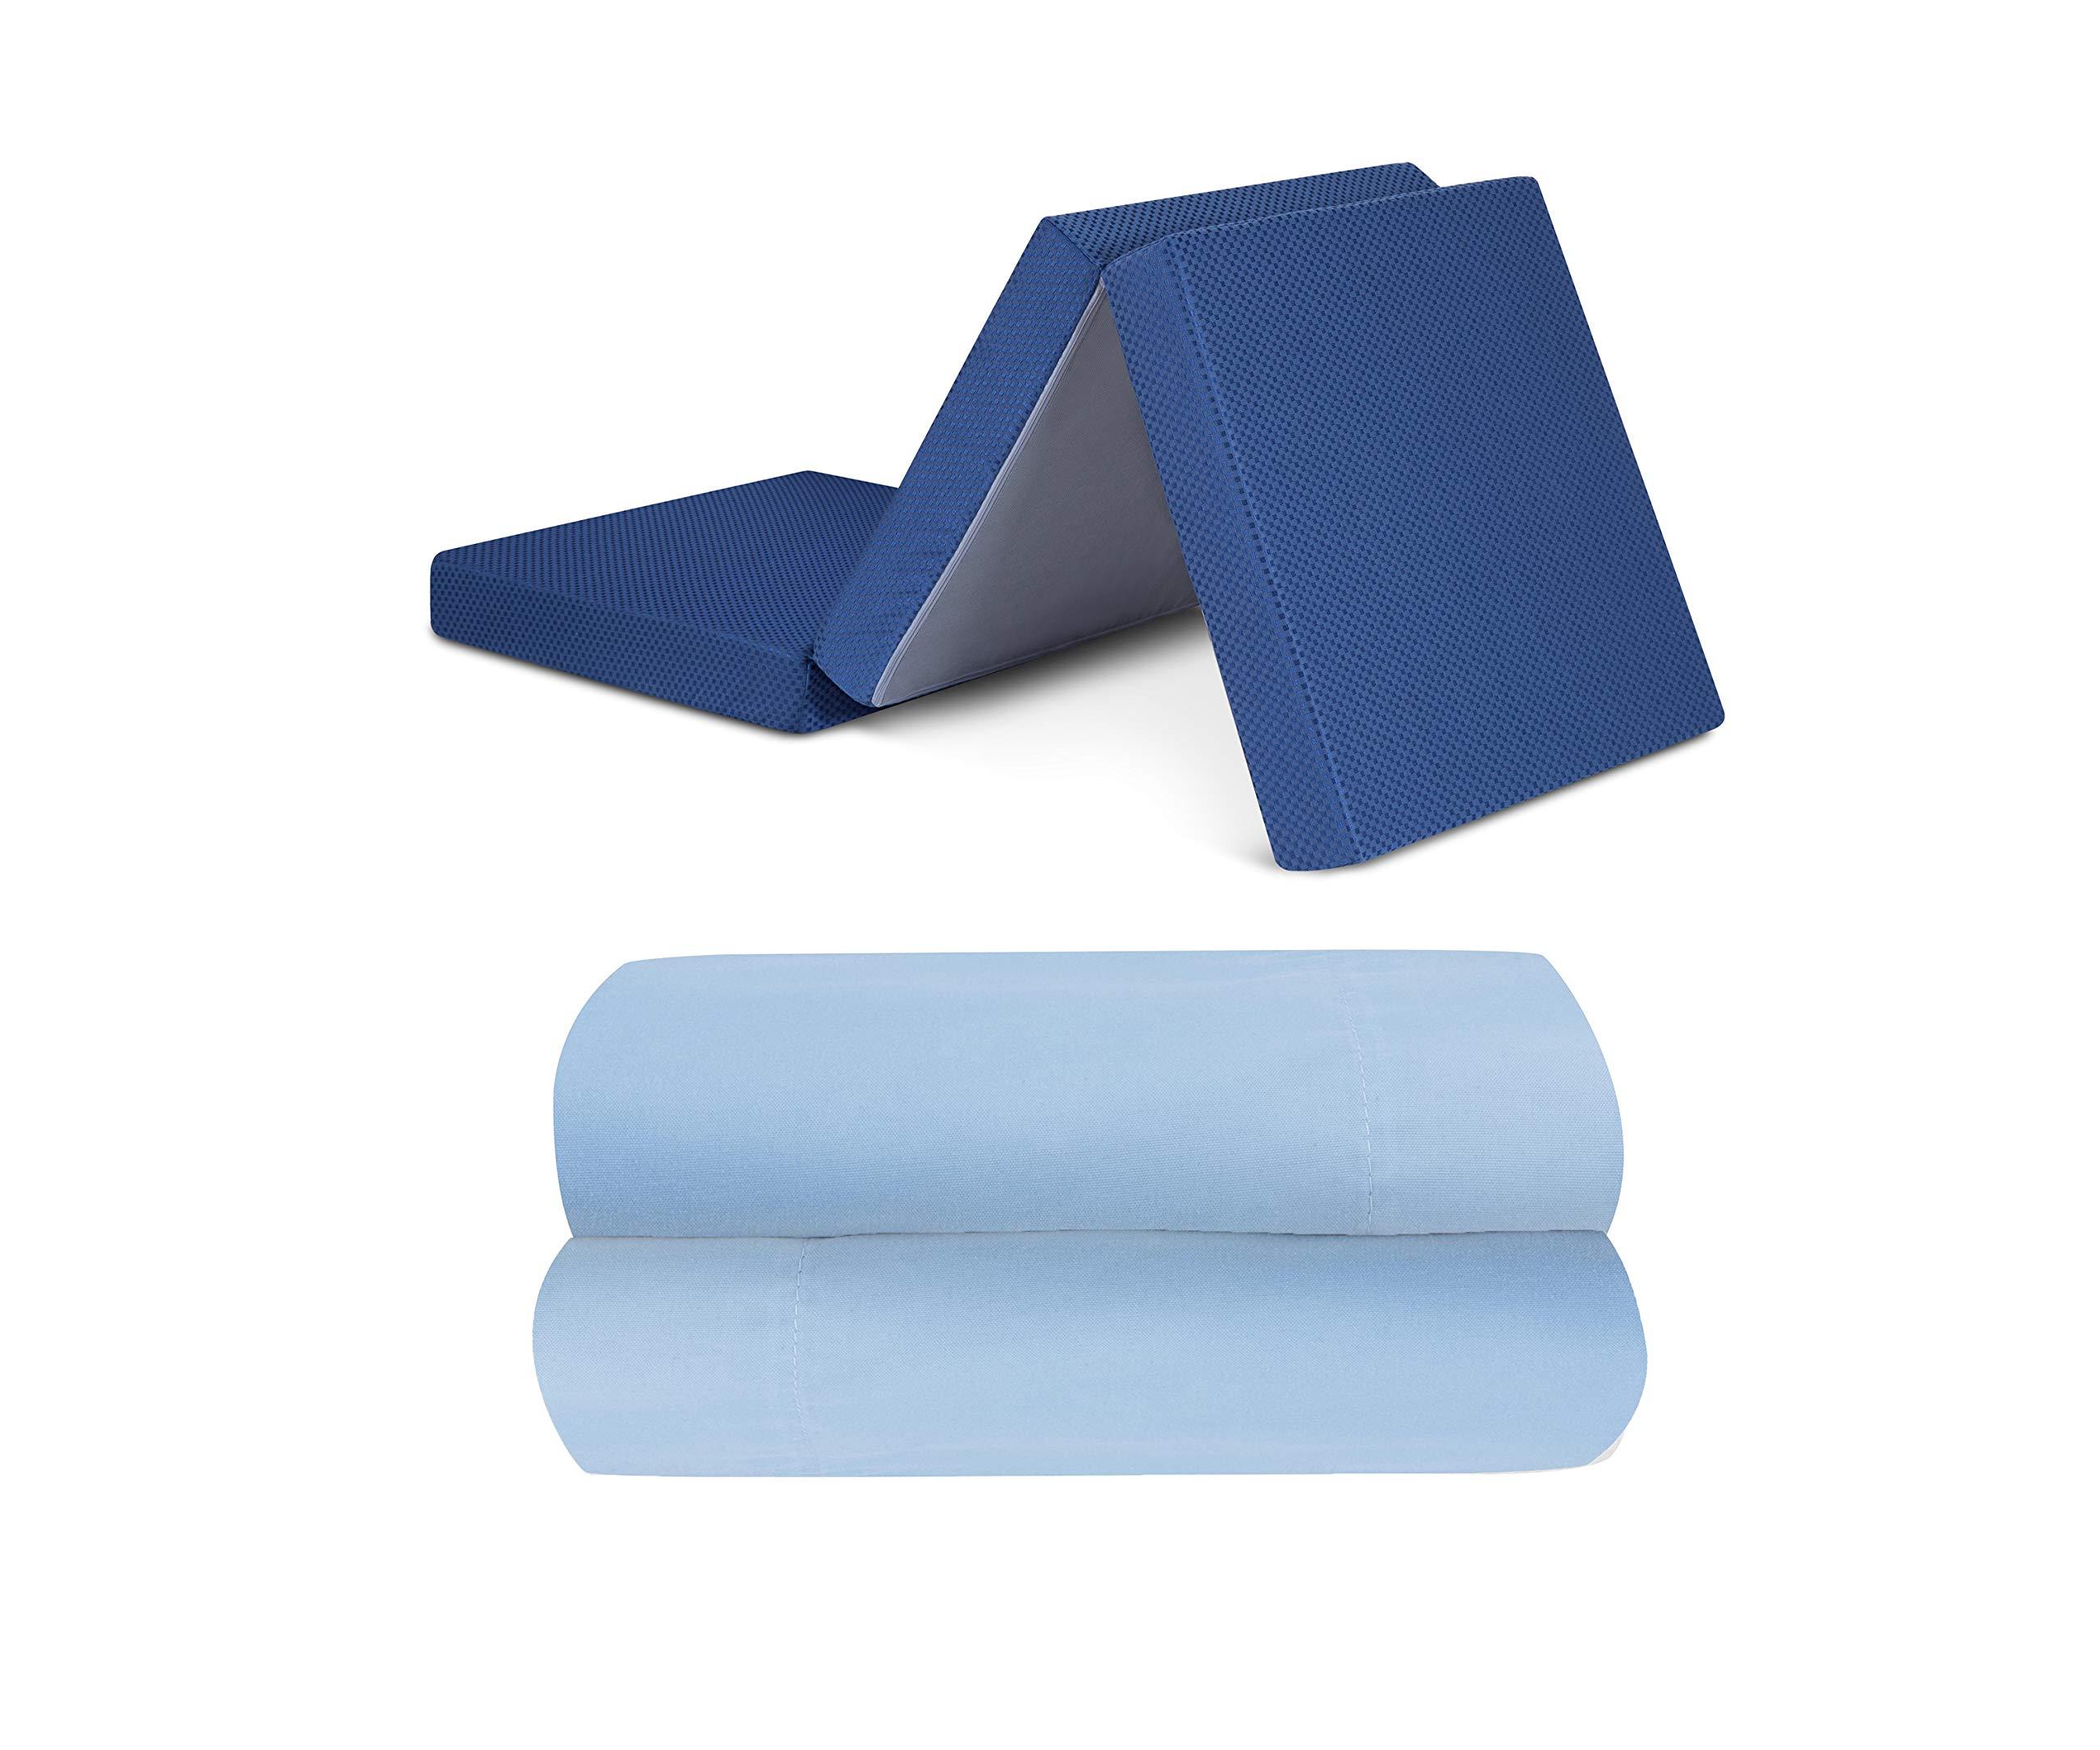 GranRest 4'' Tri Folding Memory Foam Mattress, Blue Bundle with Mainstays Microfiber Basics Sheet Set, Twin Size, Light Blue